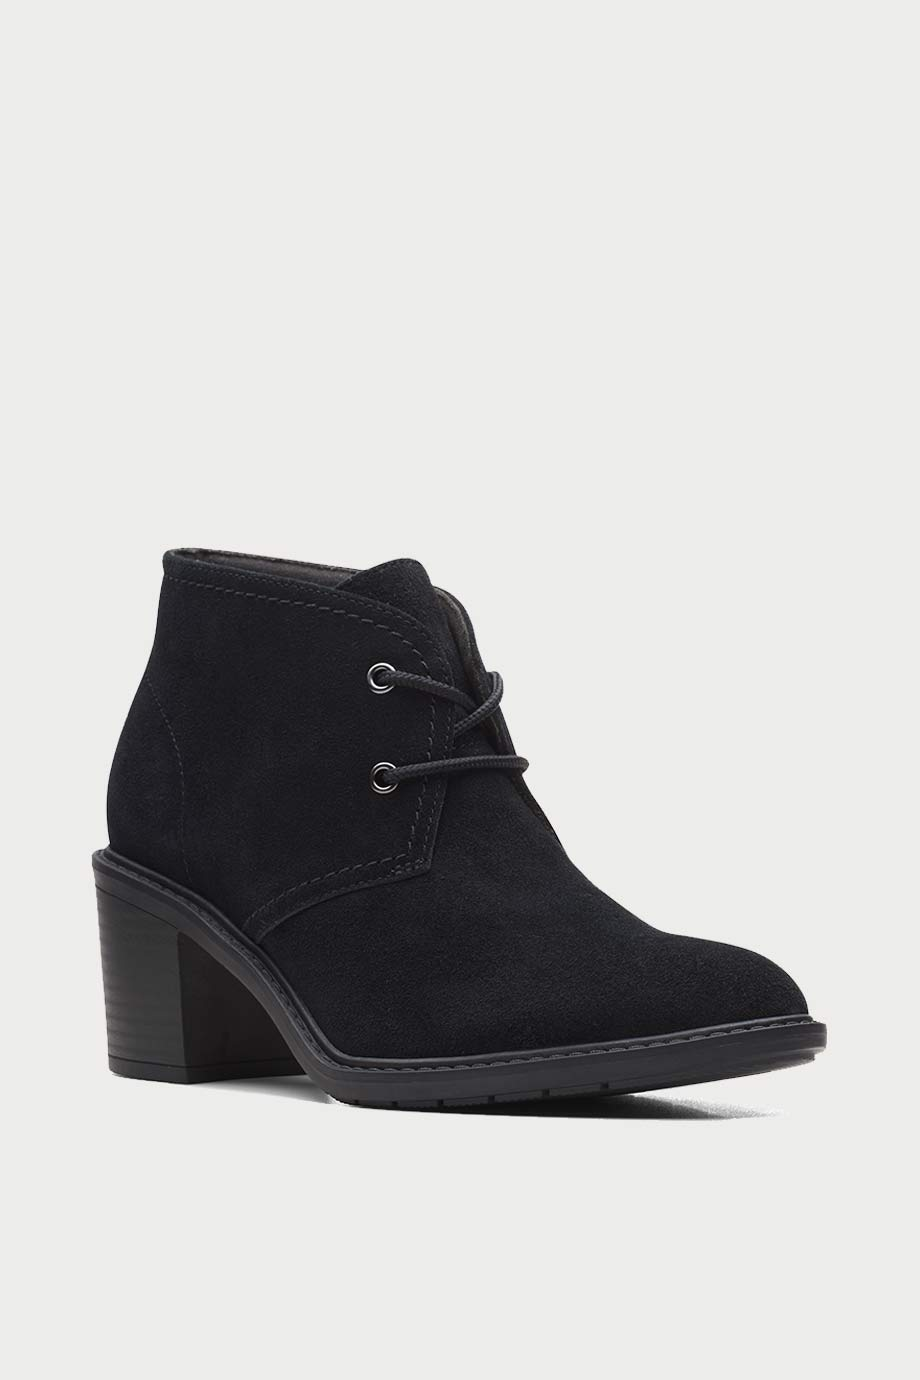 spiridoula metheniti shoes xalkida p scene laceboot black suede clarks 2